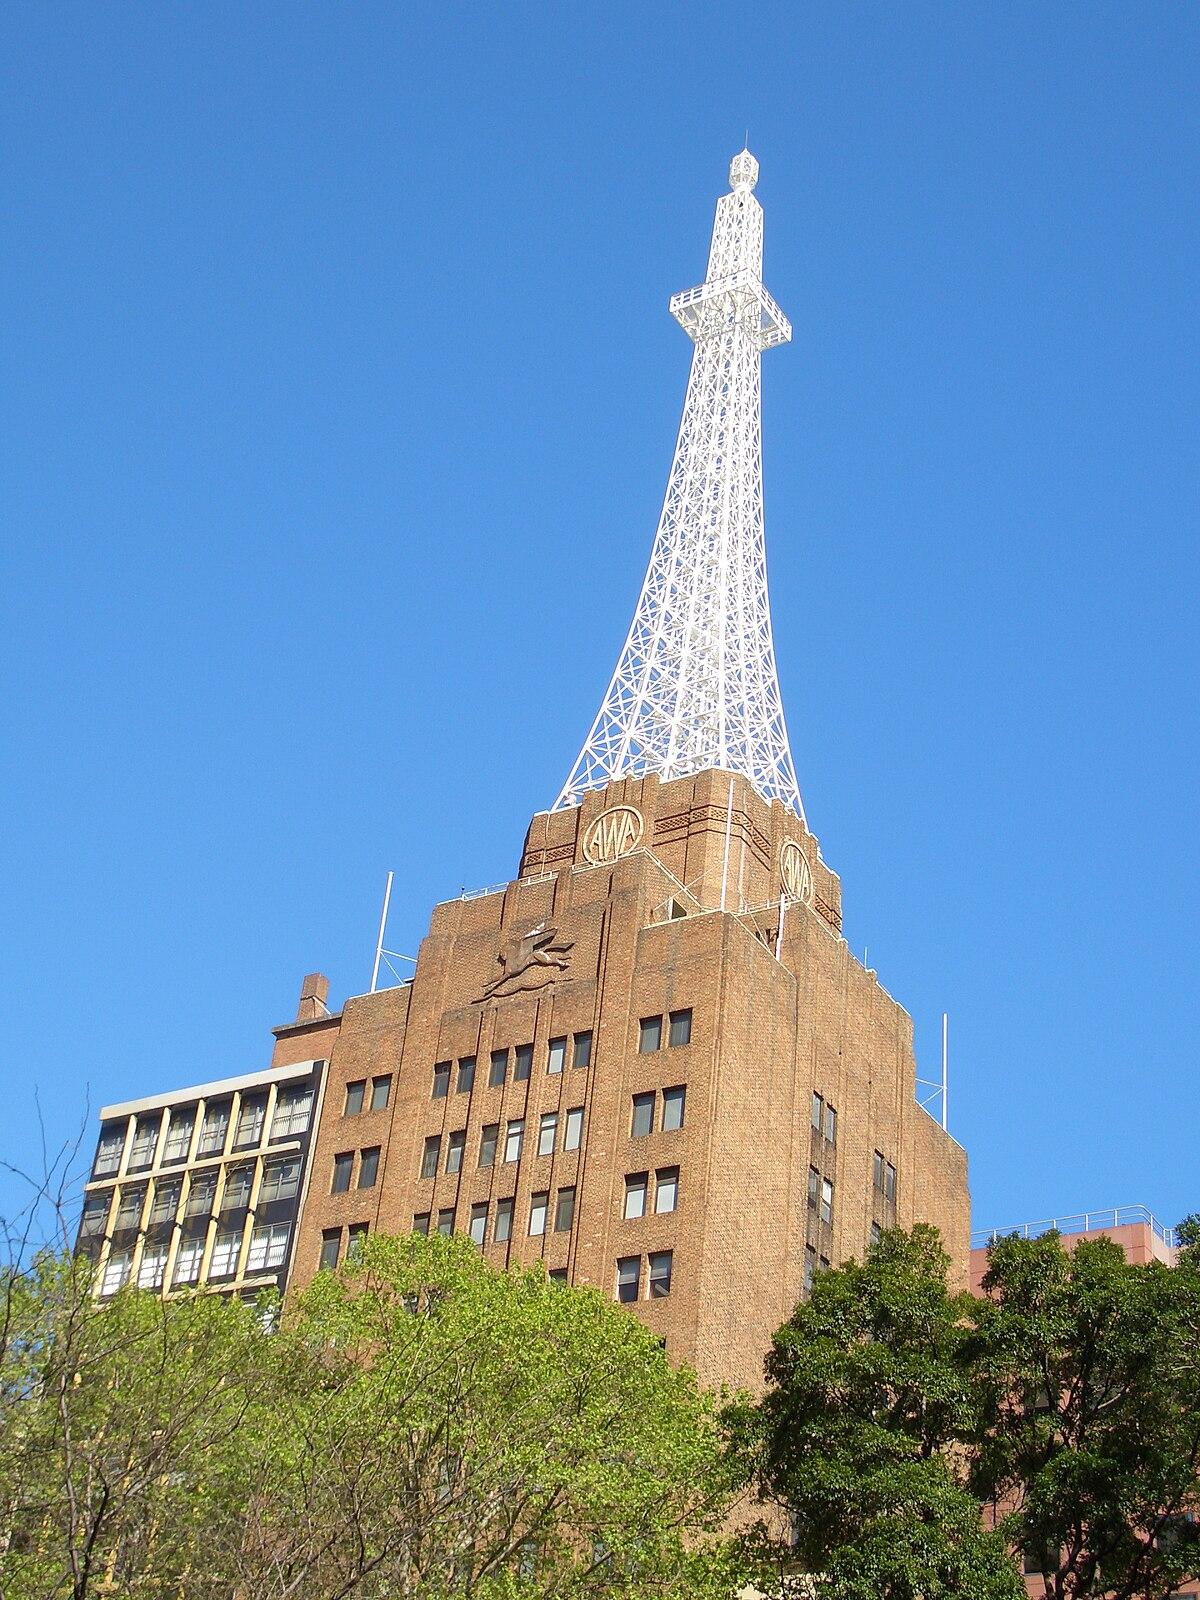 Px Amalgamated Wireless Australia Tower C Sydney Central Business District